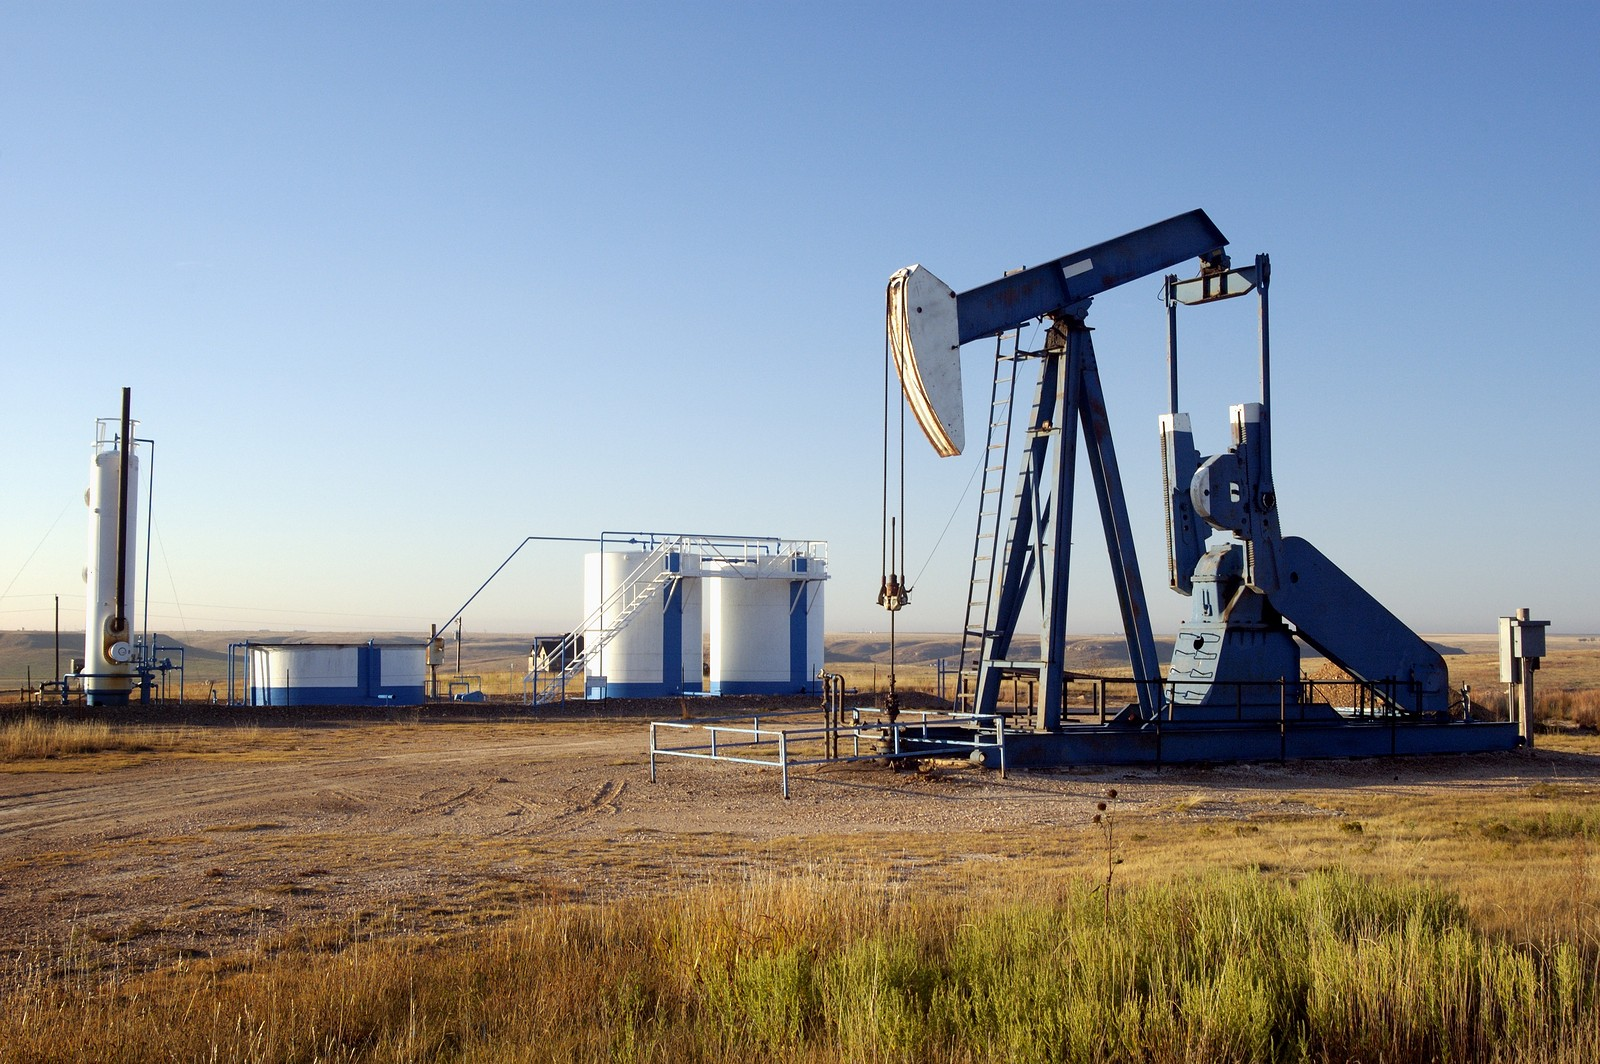 Oil well + storage tanks